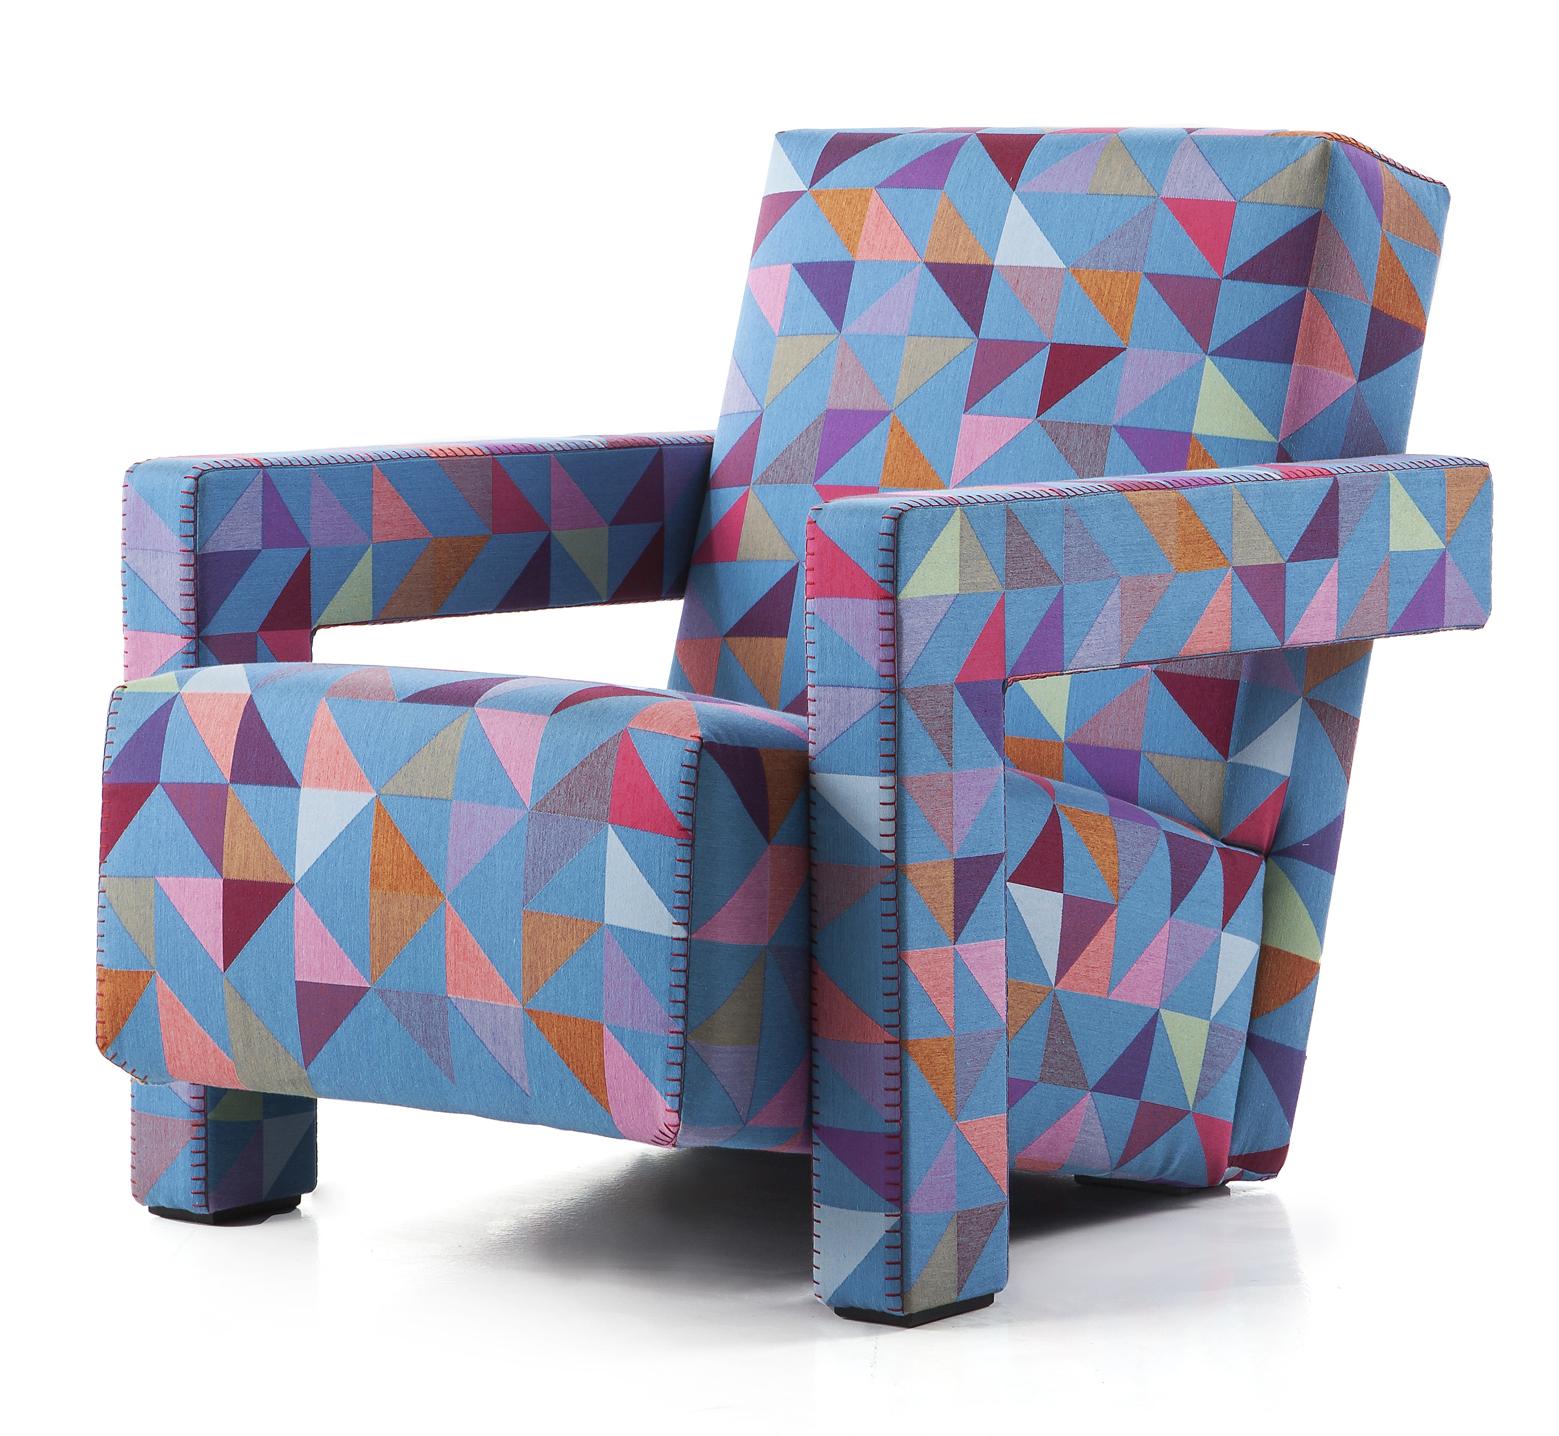 3_CASSINA_Utrecht Collectors' Edition_Bertjan Pot Boxblocks fabric_blue.jpg